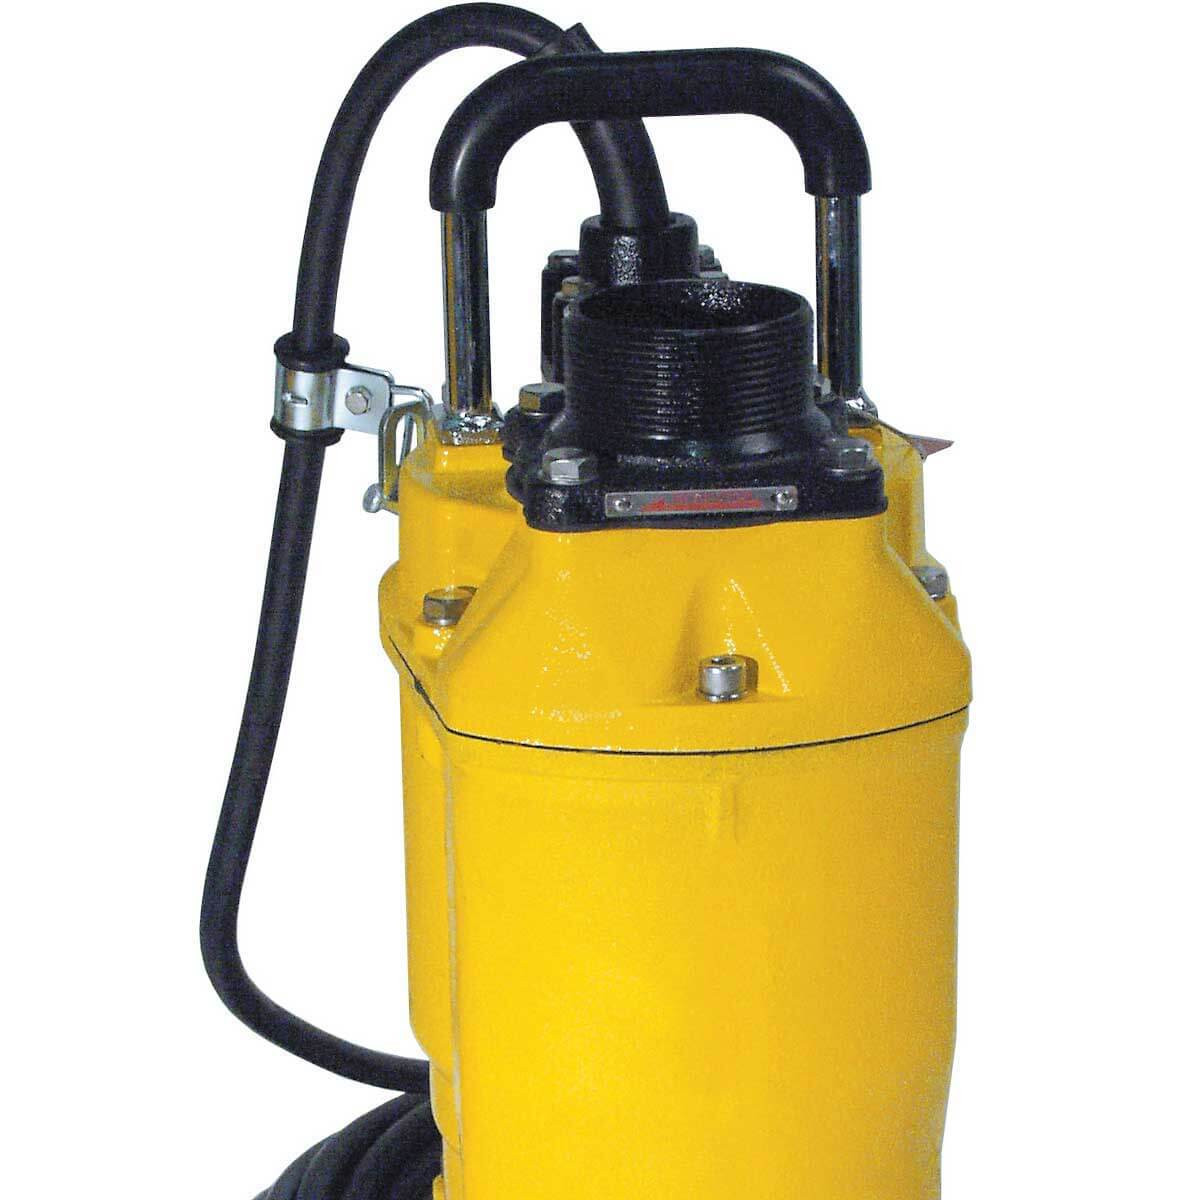 Wacker Neuson 3 inch Submersible Pump 220V 3 Phase PS35503